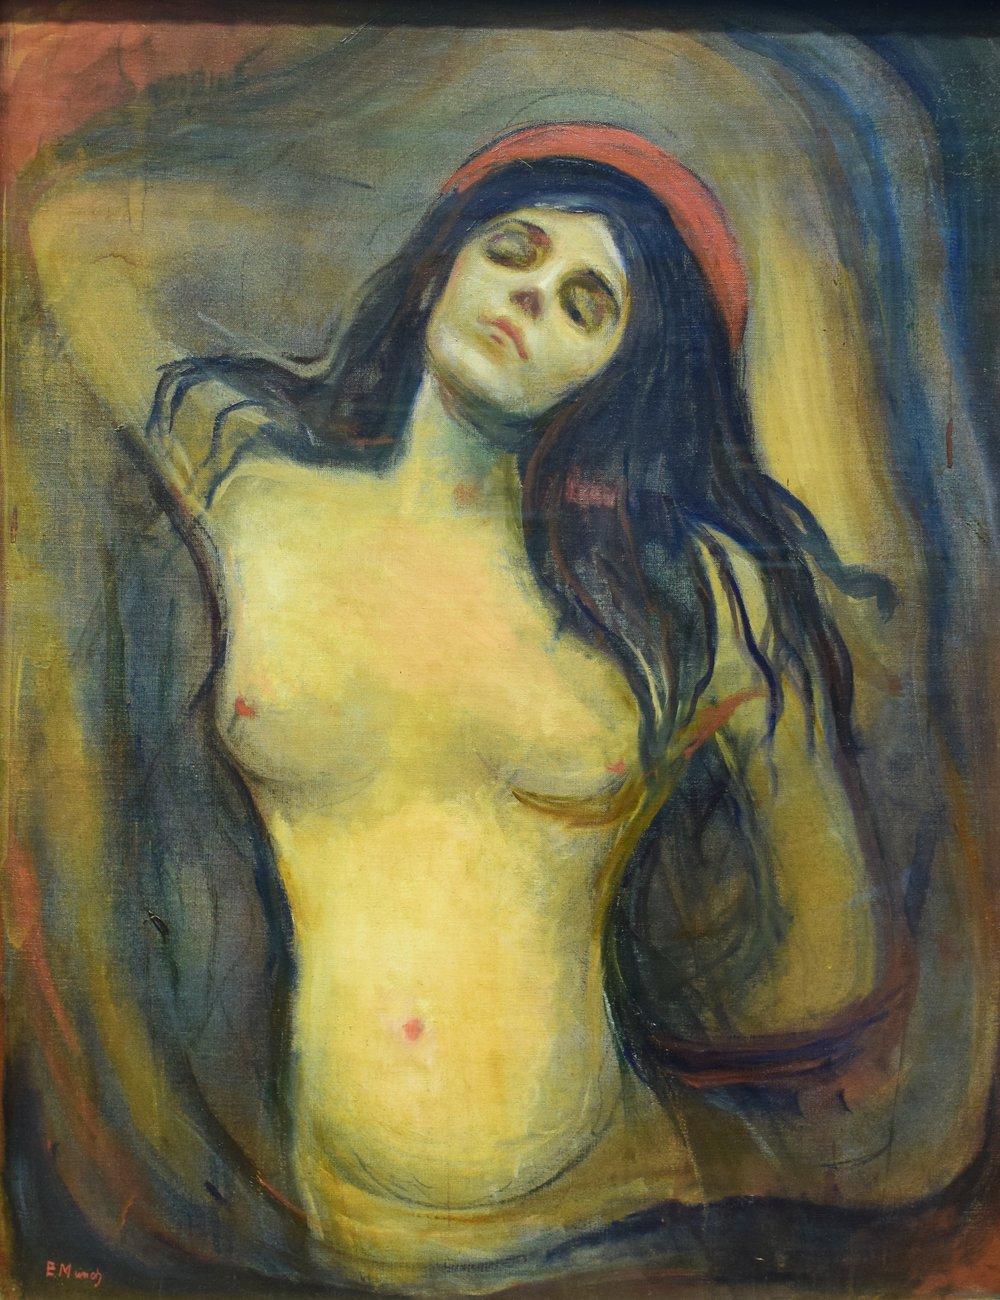 Edvard Munch, Madonna, 1894-95, Nasjonalmuseet